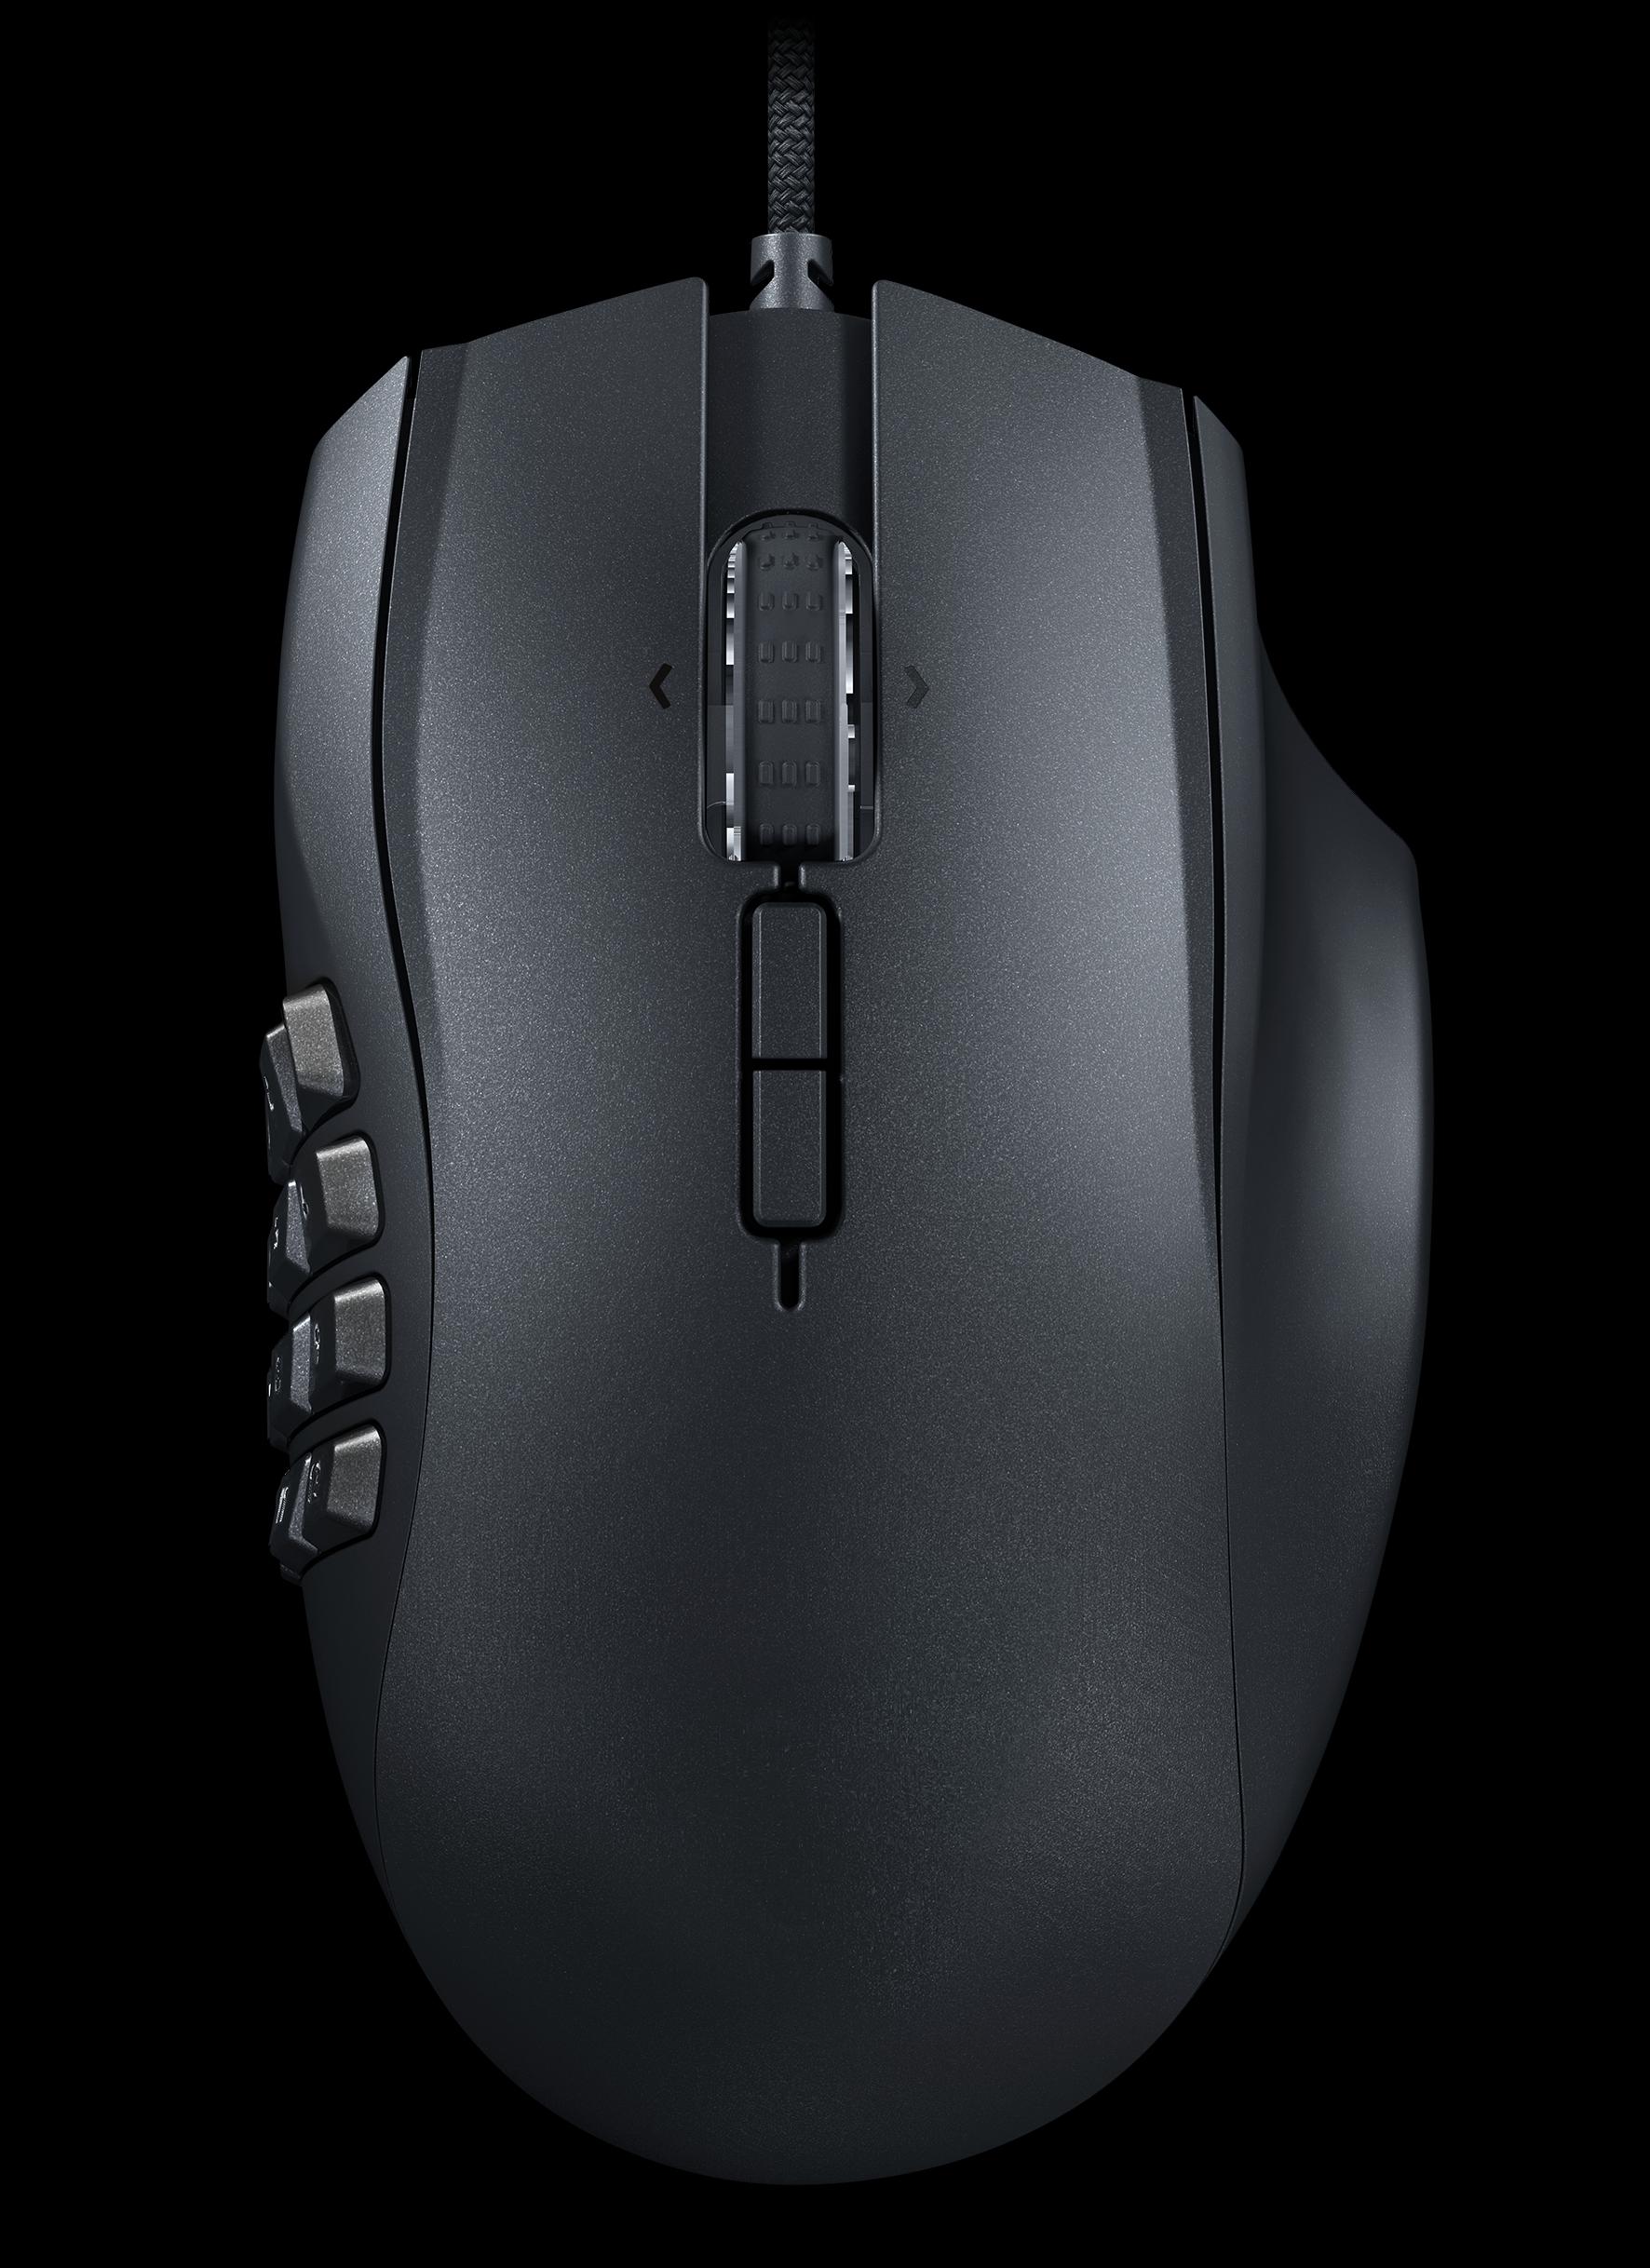 Razer Naga Chroma - Best MMO Gaming Mouse